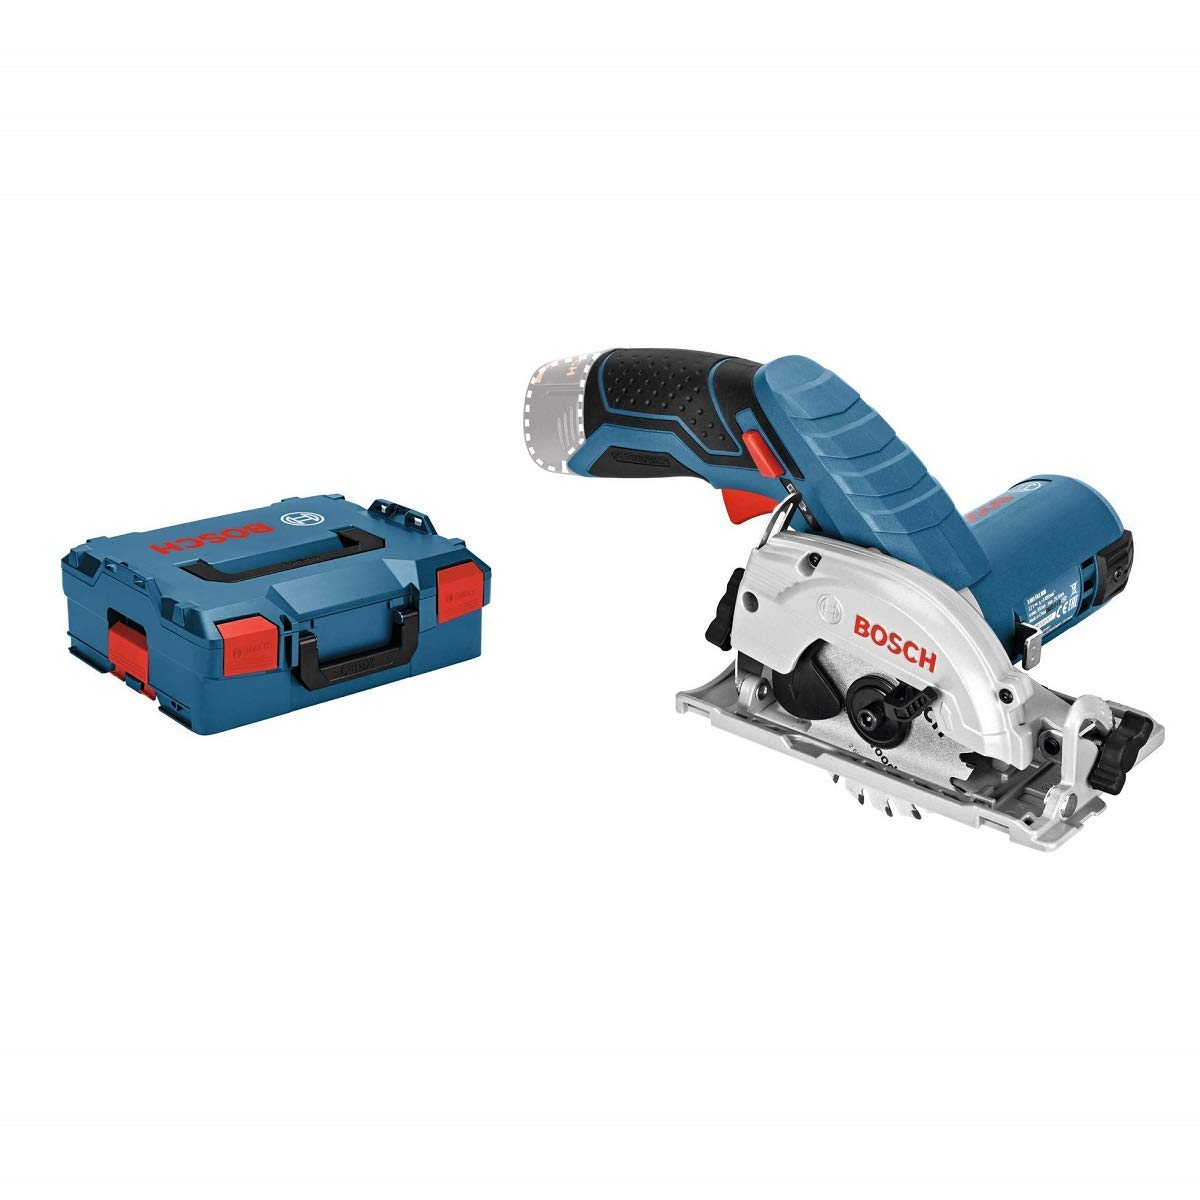 Bosch Gks 10 8 V Li Solo Professional Circular Saw In L Boxx 06016 A1002 Buy Online In Angola At Angola Desertcart Com Productid 167774151